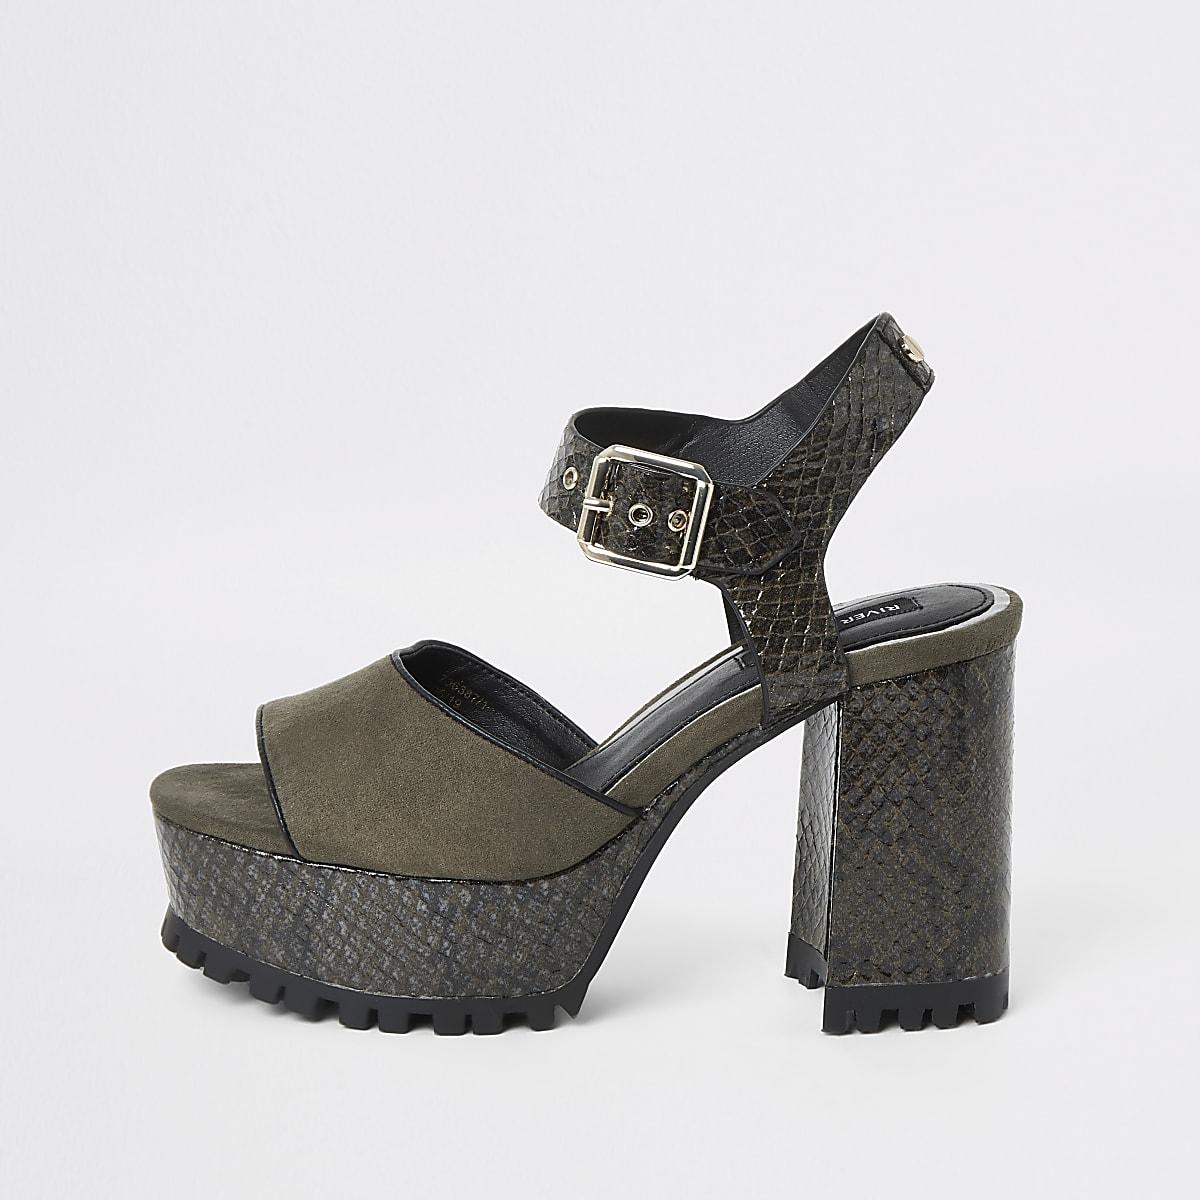 Sandales plateformeà semelle crantée en effet croco kaki